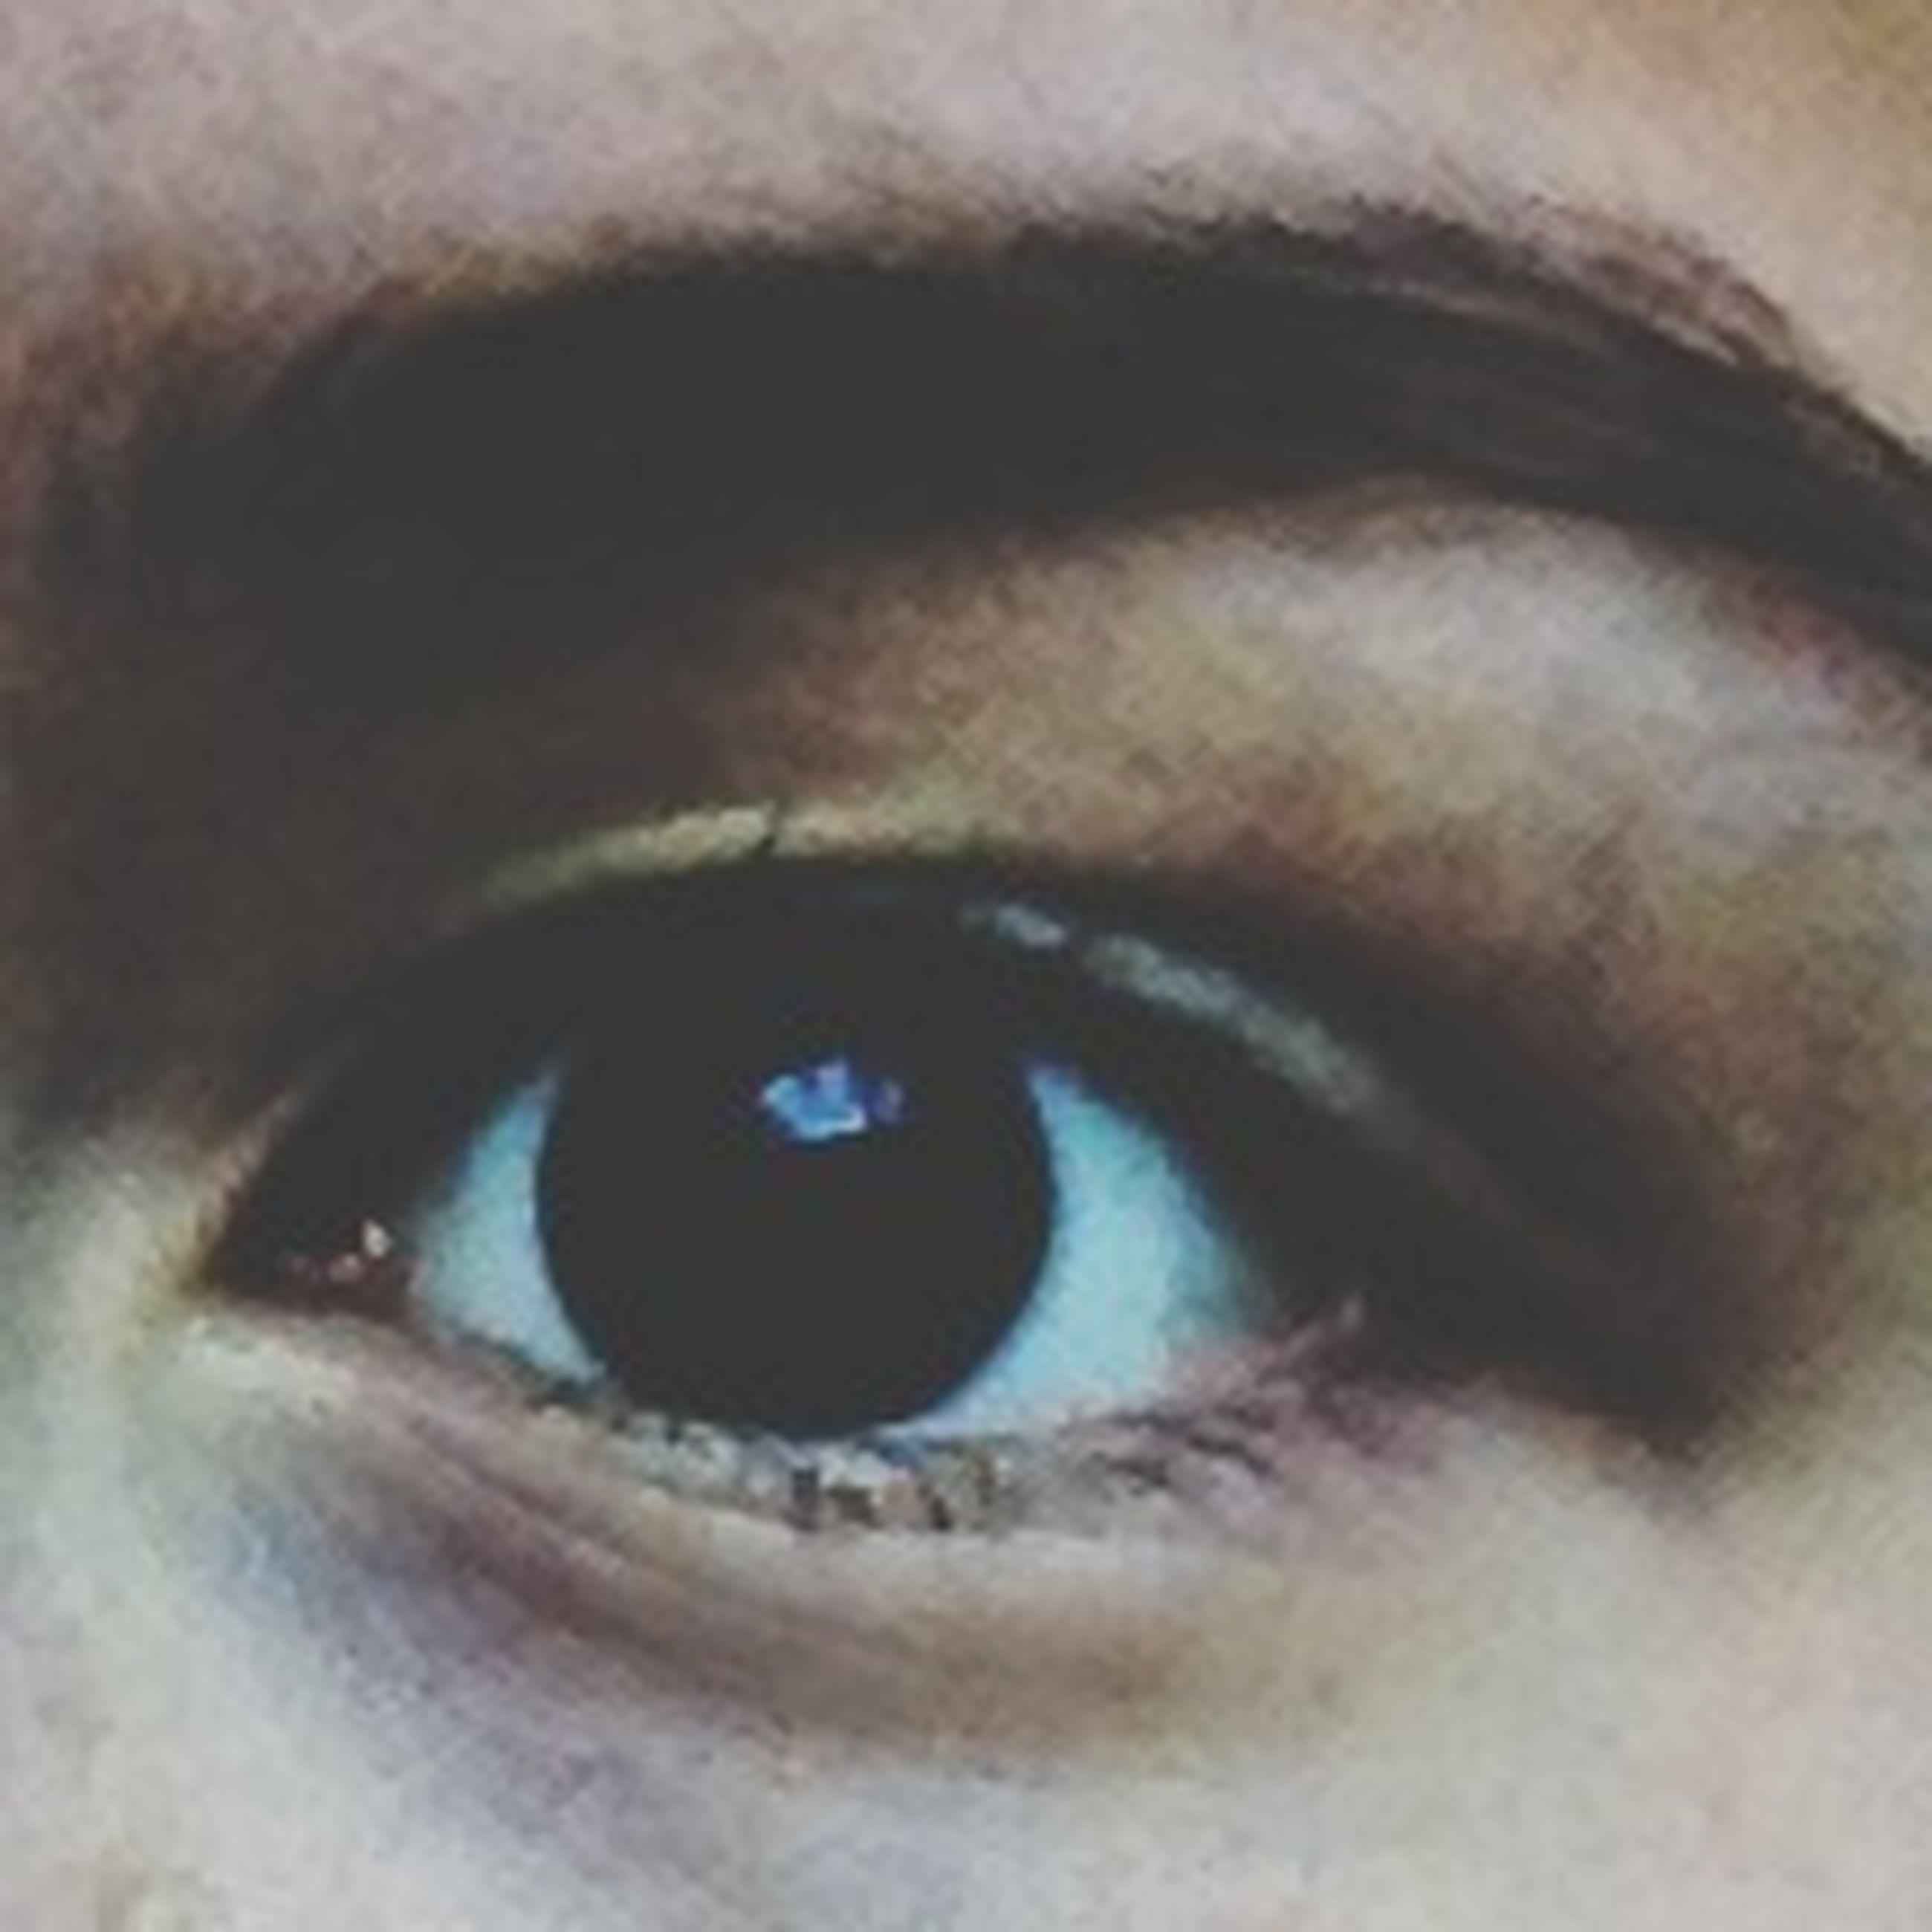 human eye, close-up, eyelash, eyesight, indoors, extreme close-up, part of, sensory perception, human skin, full frame, human face, looking at camera, extreme close up, portrait, detail, backgrounds, eyeball